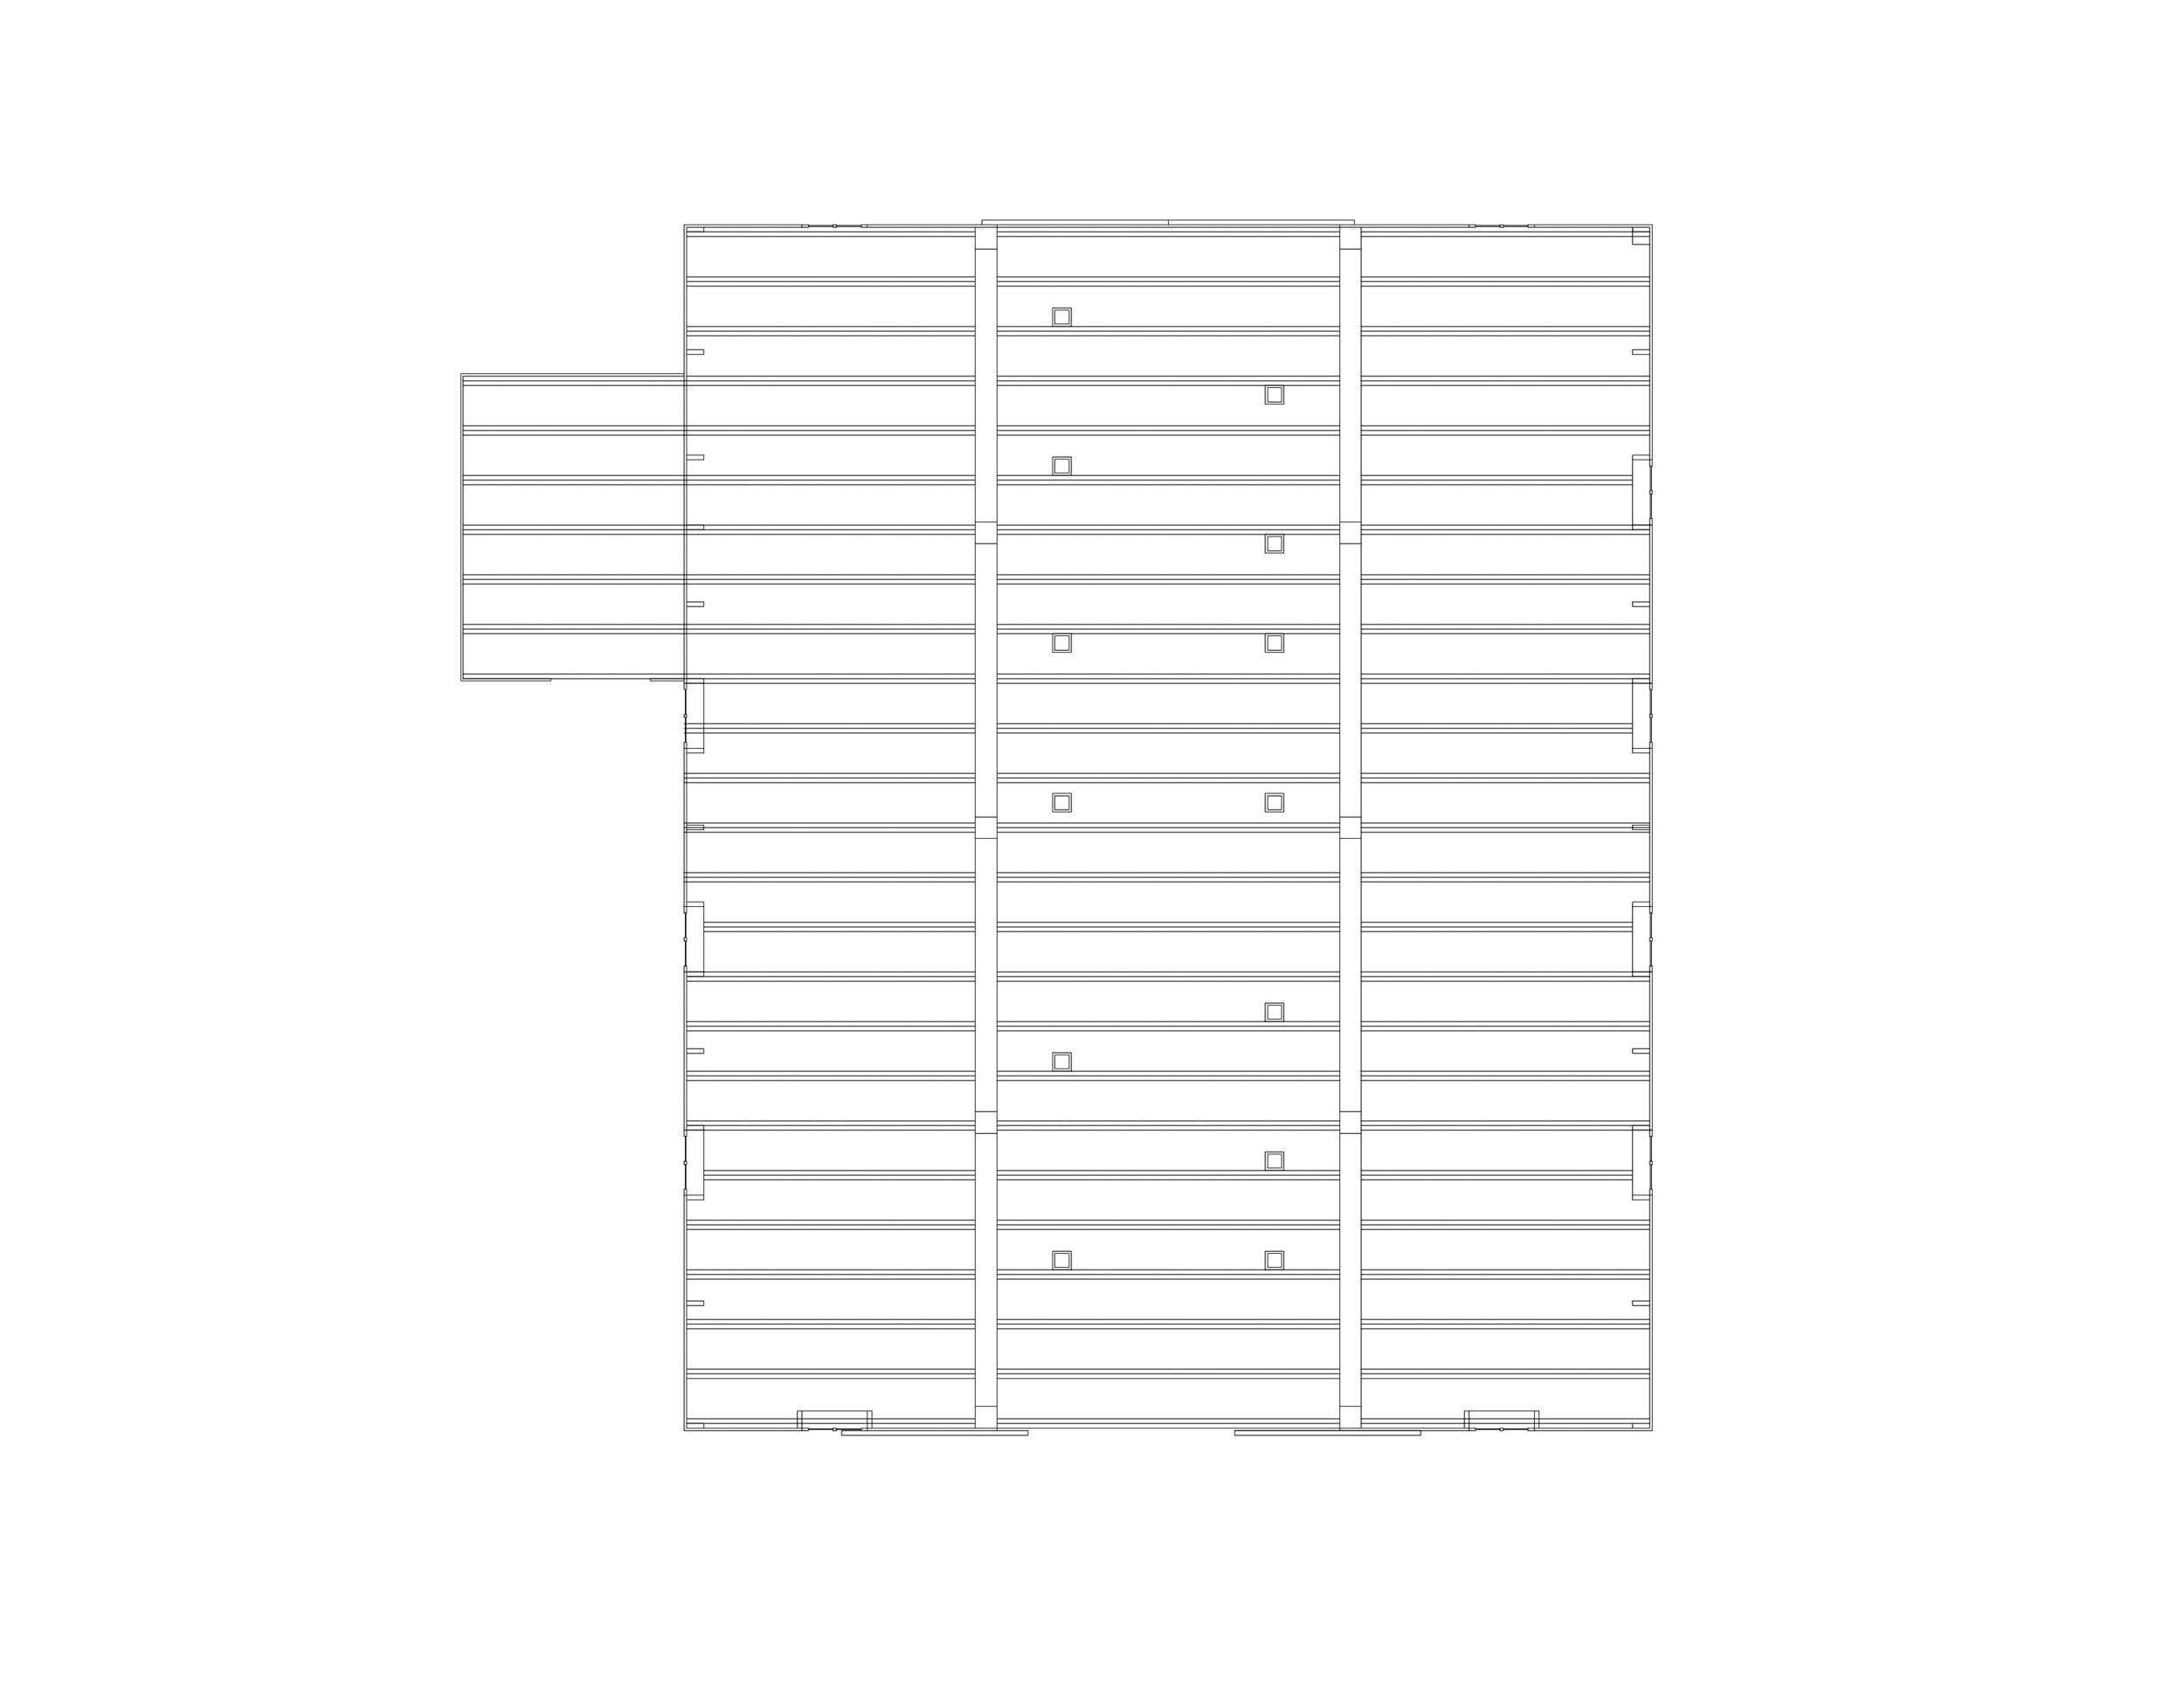 Building 1_Floor Plan 8.5x11.jpg